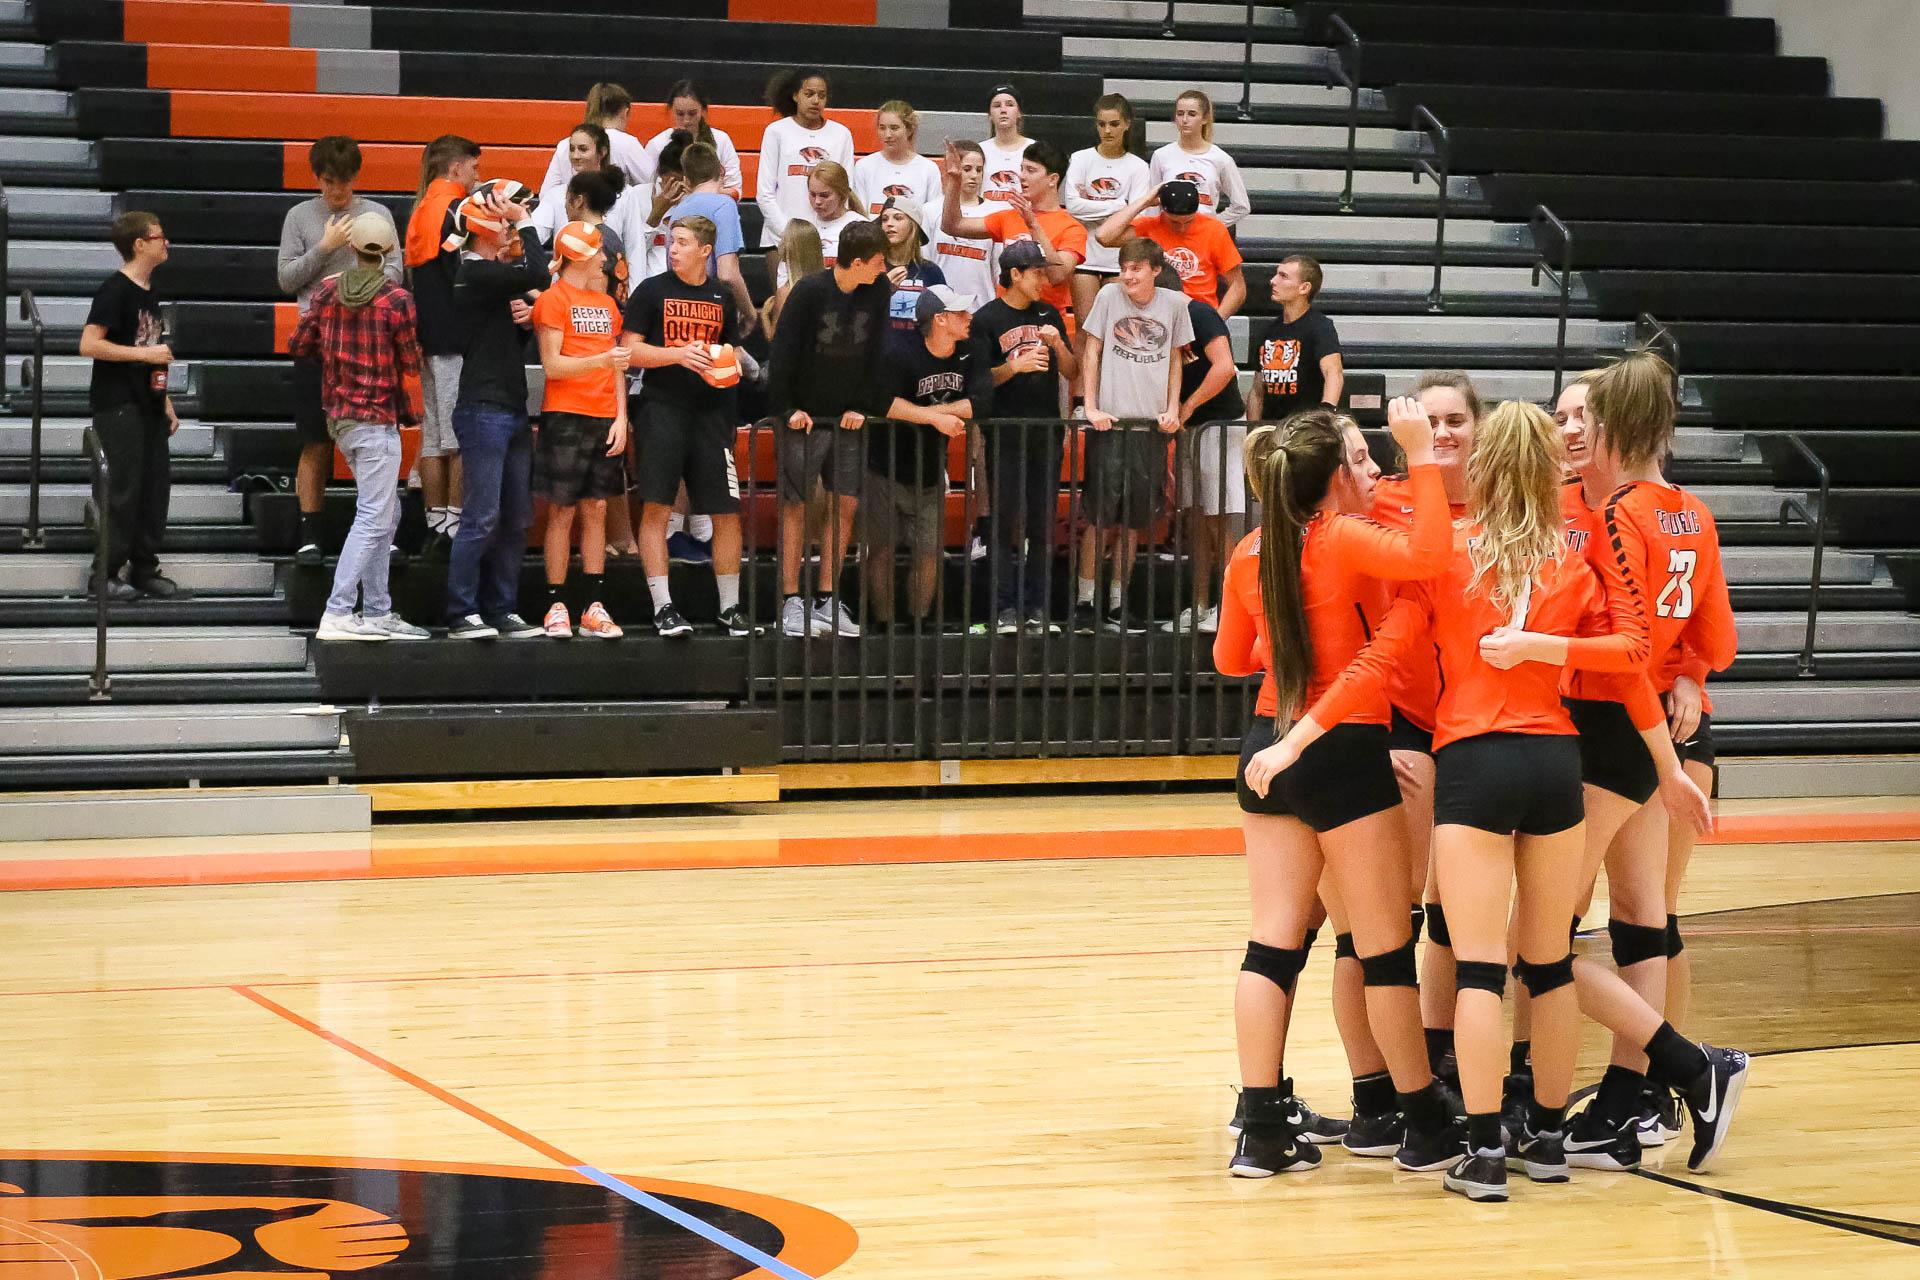 Photos:  Volleyball Varsity vs Carl Junction